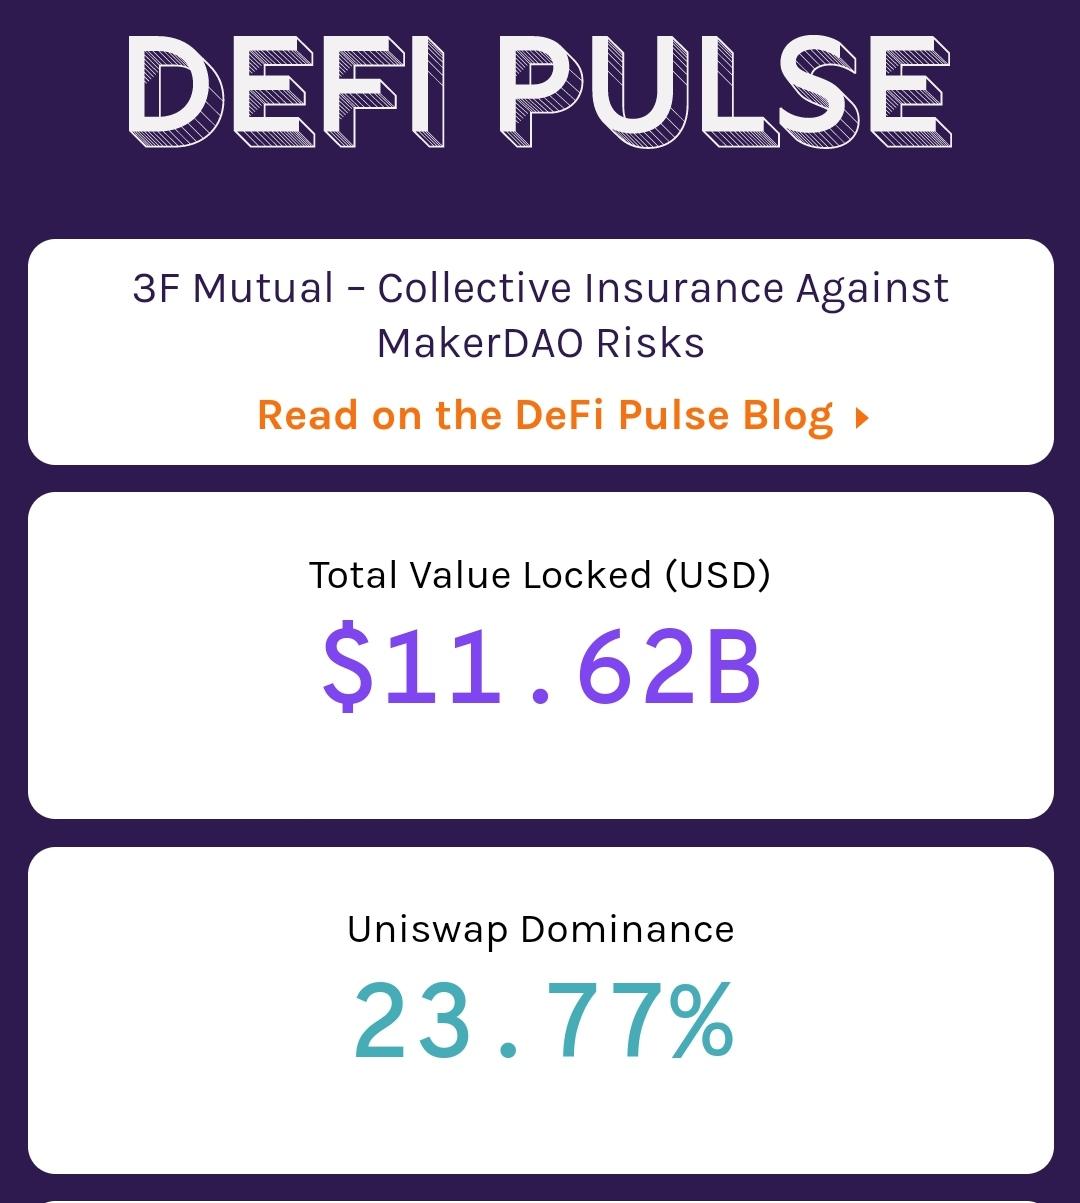 Total value locked on DeFi applications has crossed $11.62 Billion